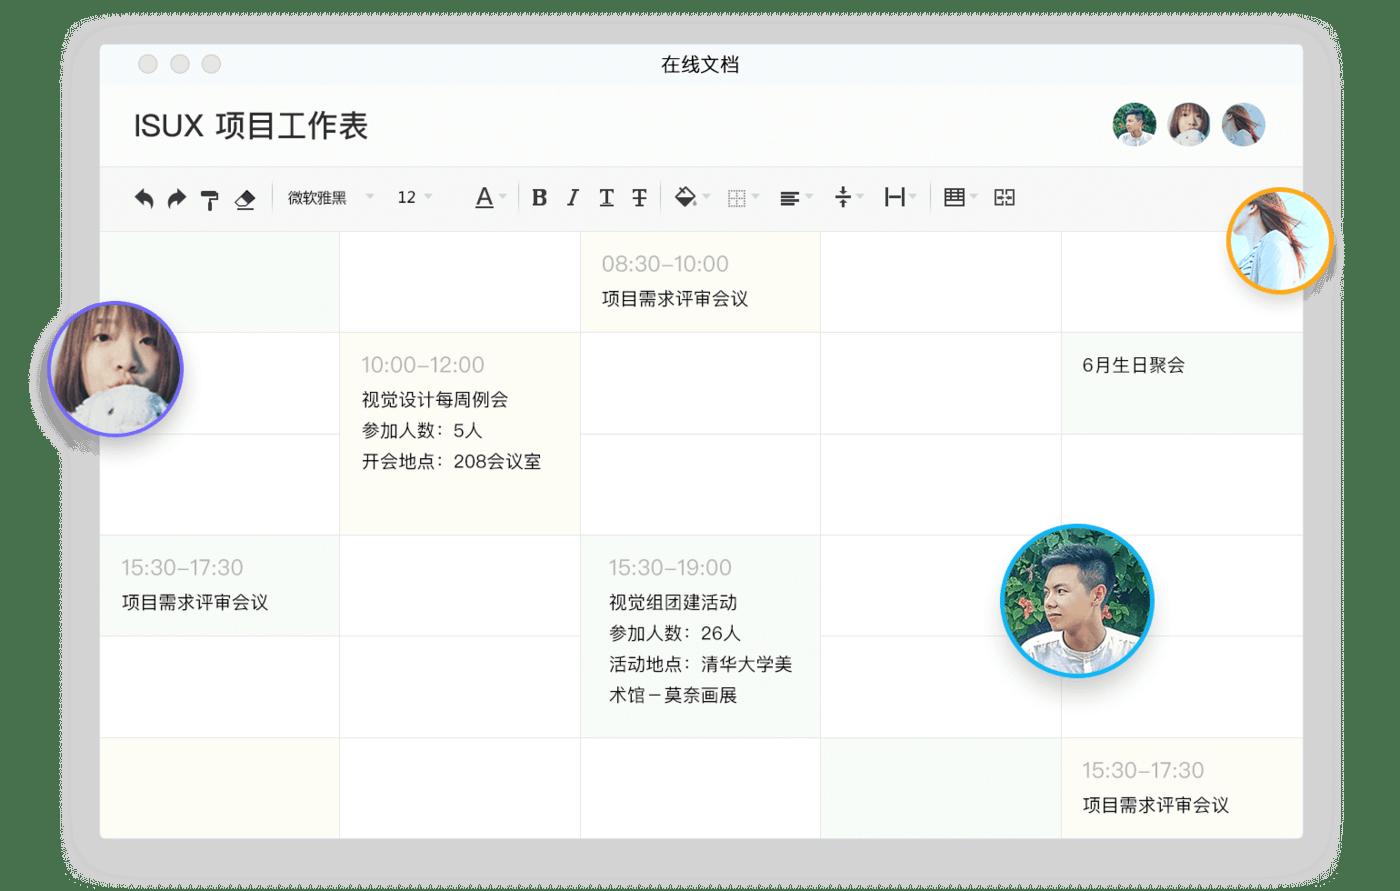 QQ Mac 在线文档编辑